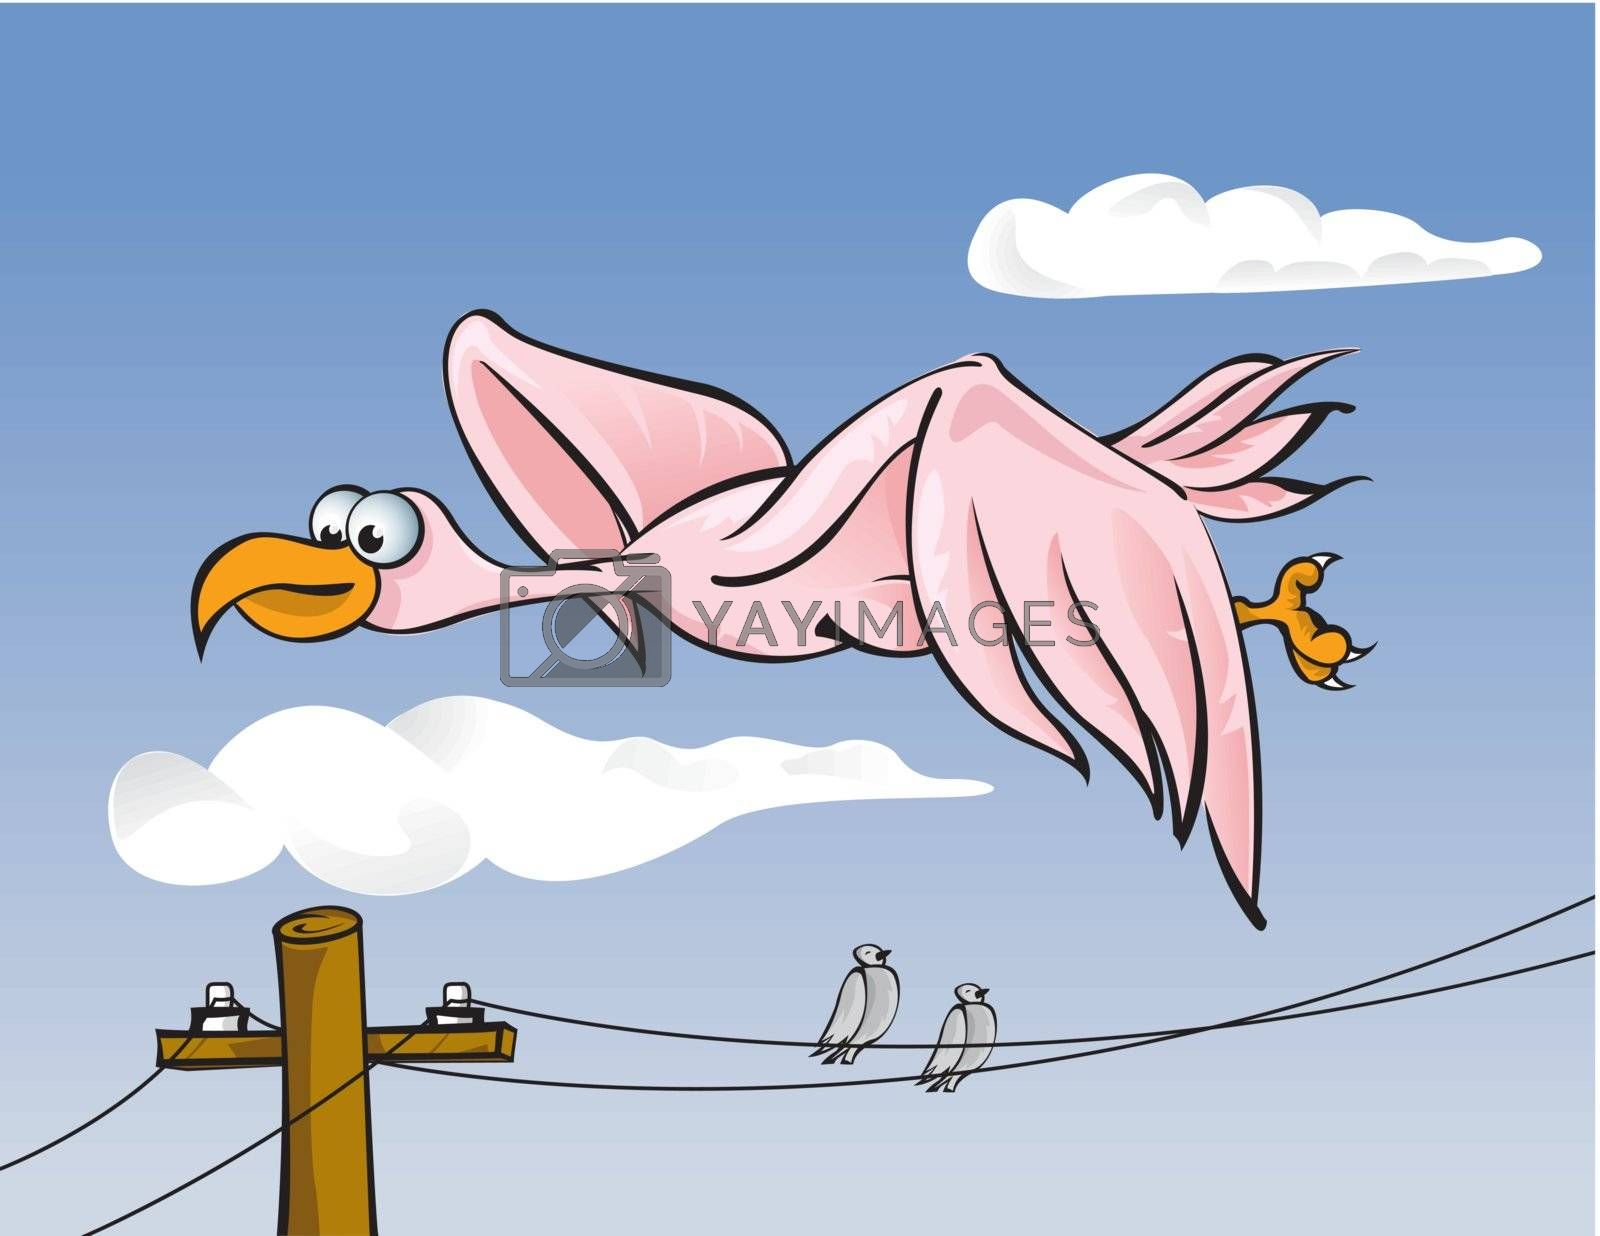 Big bird by PauloResende